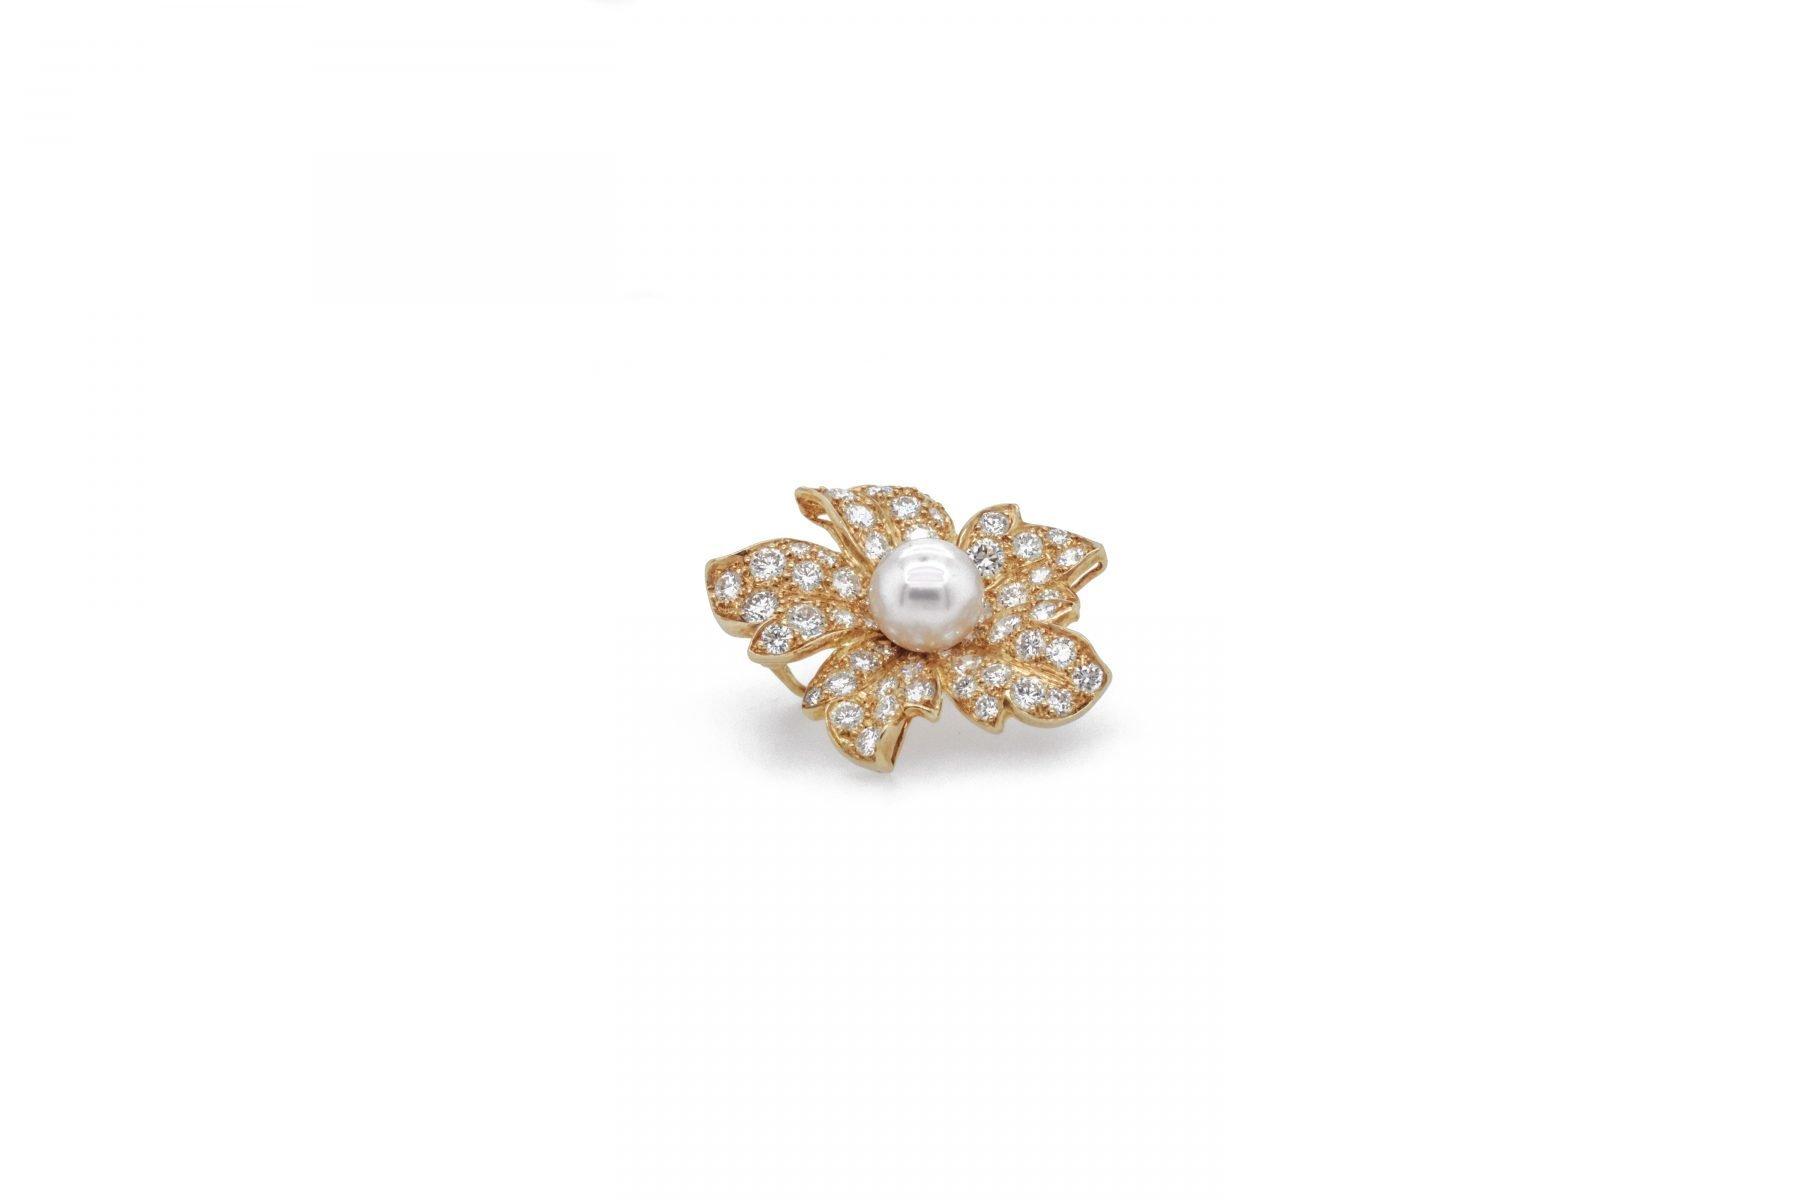 Diamond & Pearl Brooch